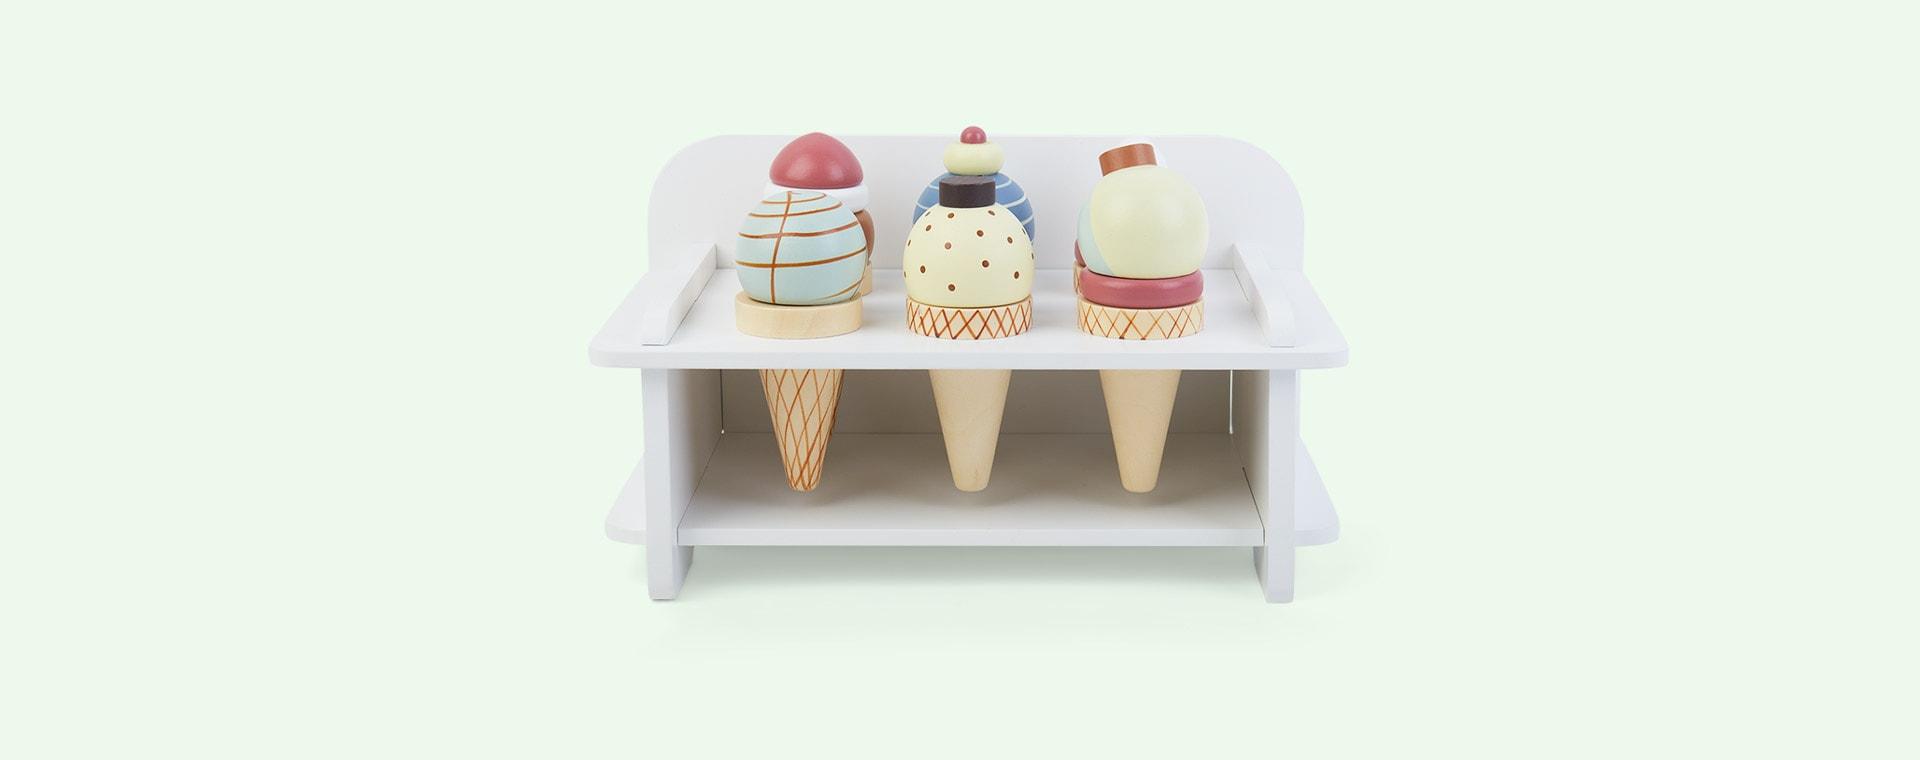 Multi Kid's Concept Ice Cream with Rack